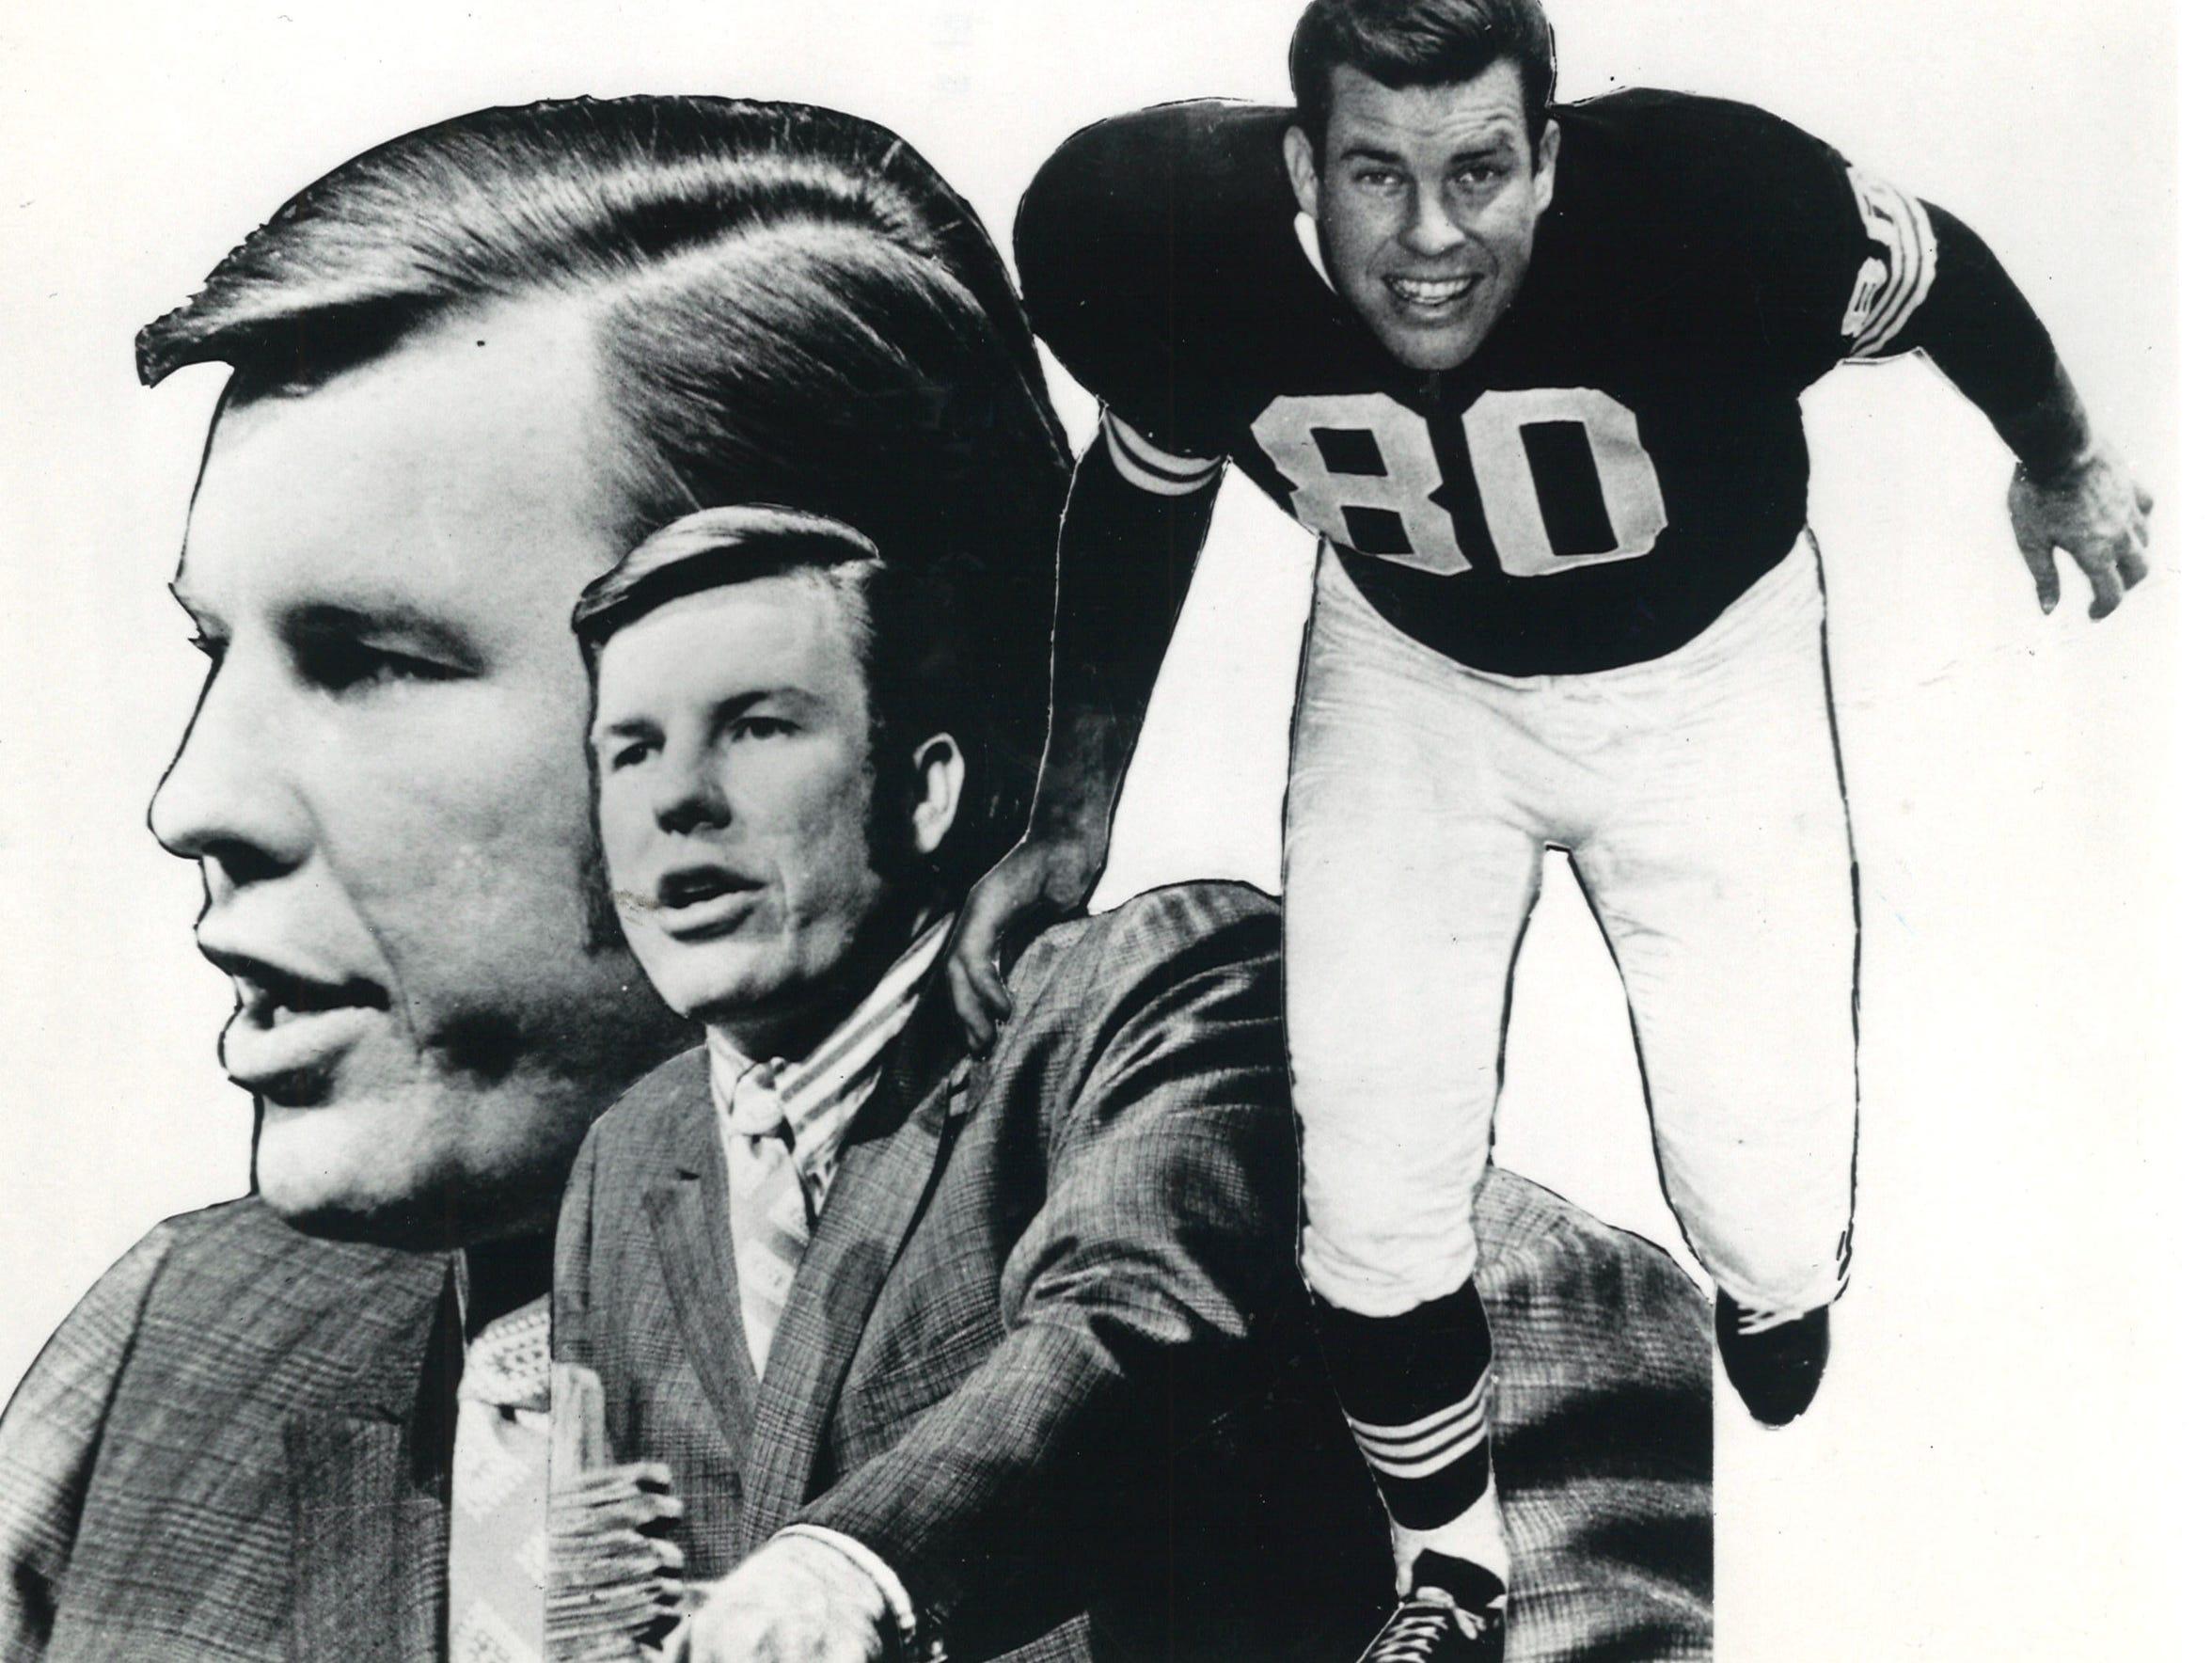 Bill Glass, a former NFL player turned evangelist,